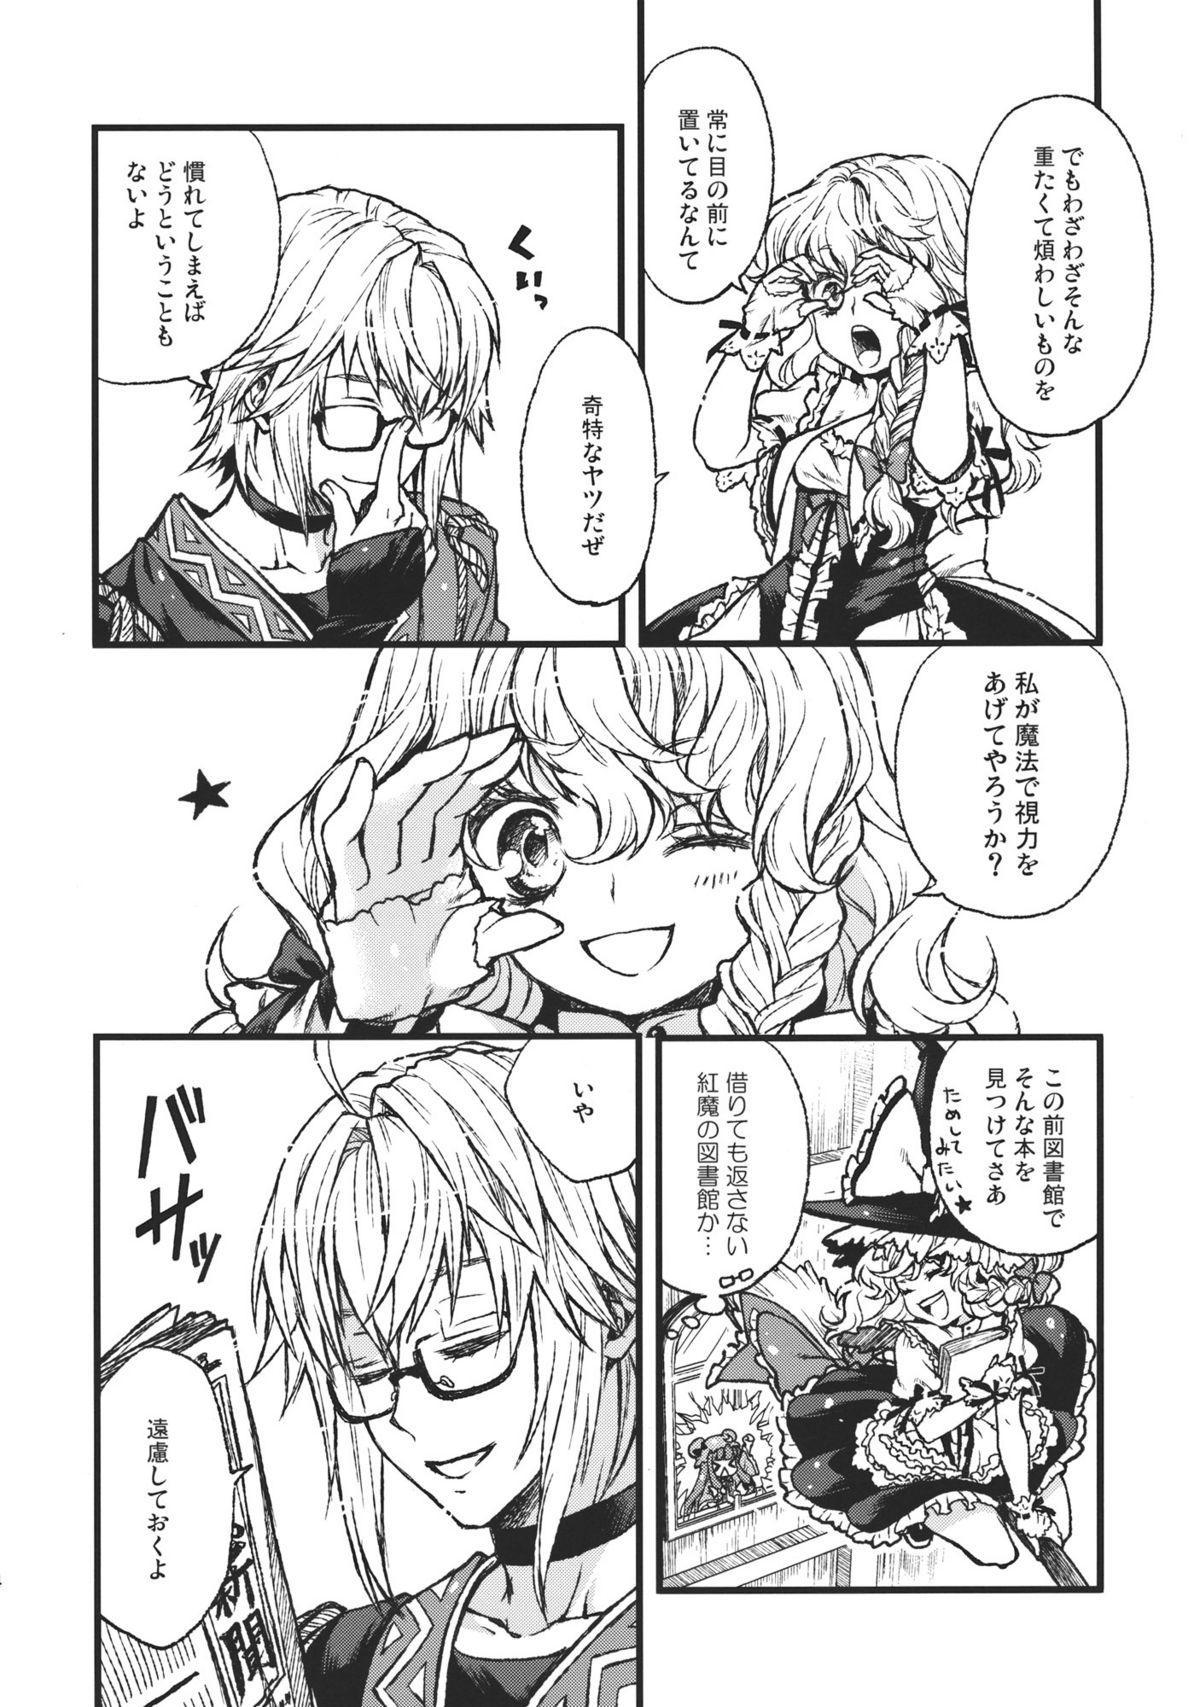 Koimegane / Iromegane 3